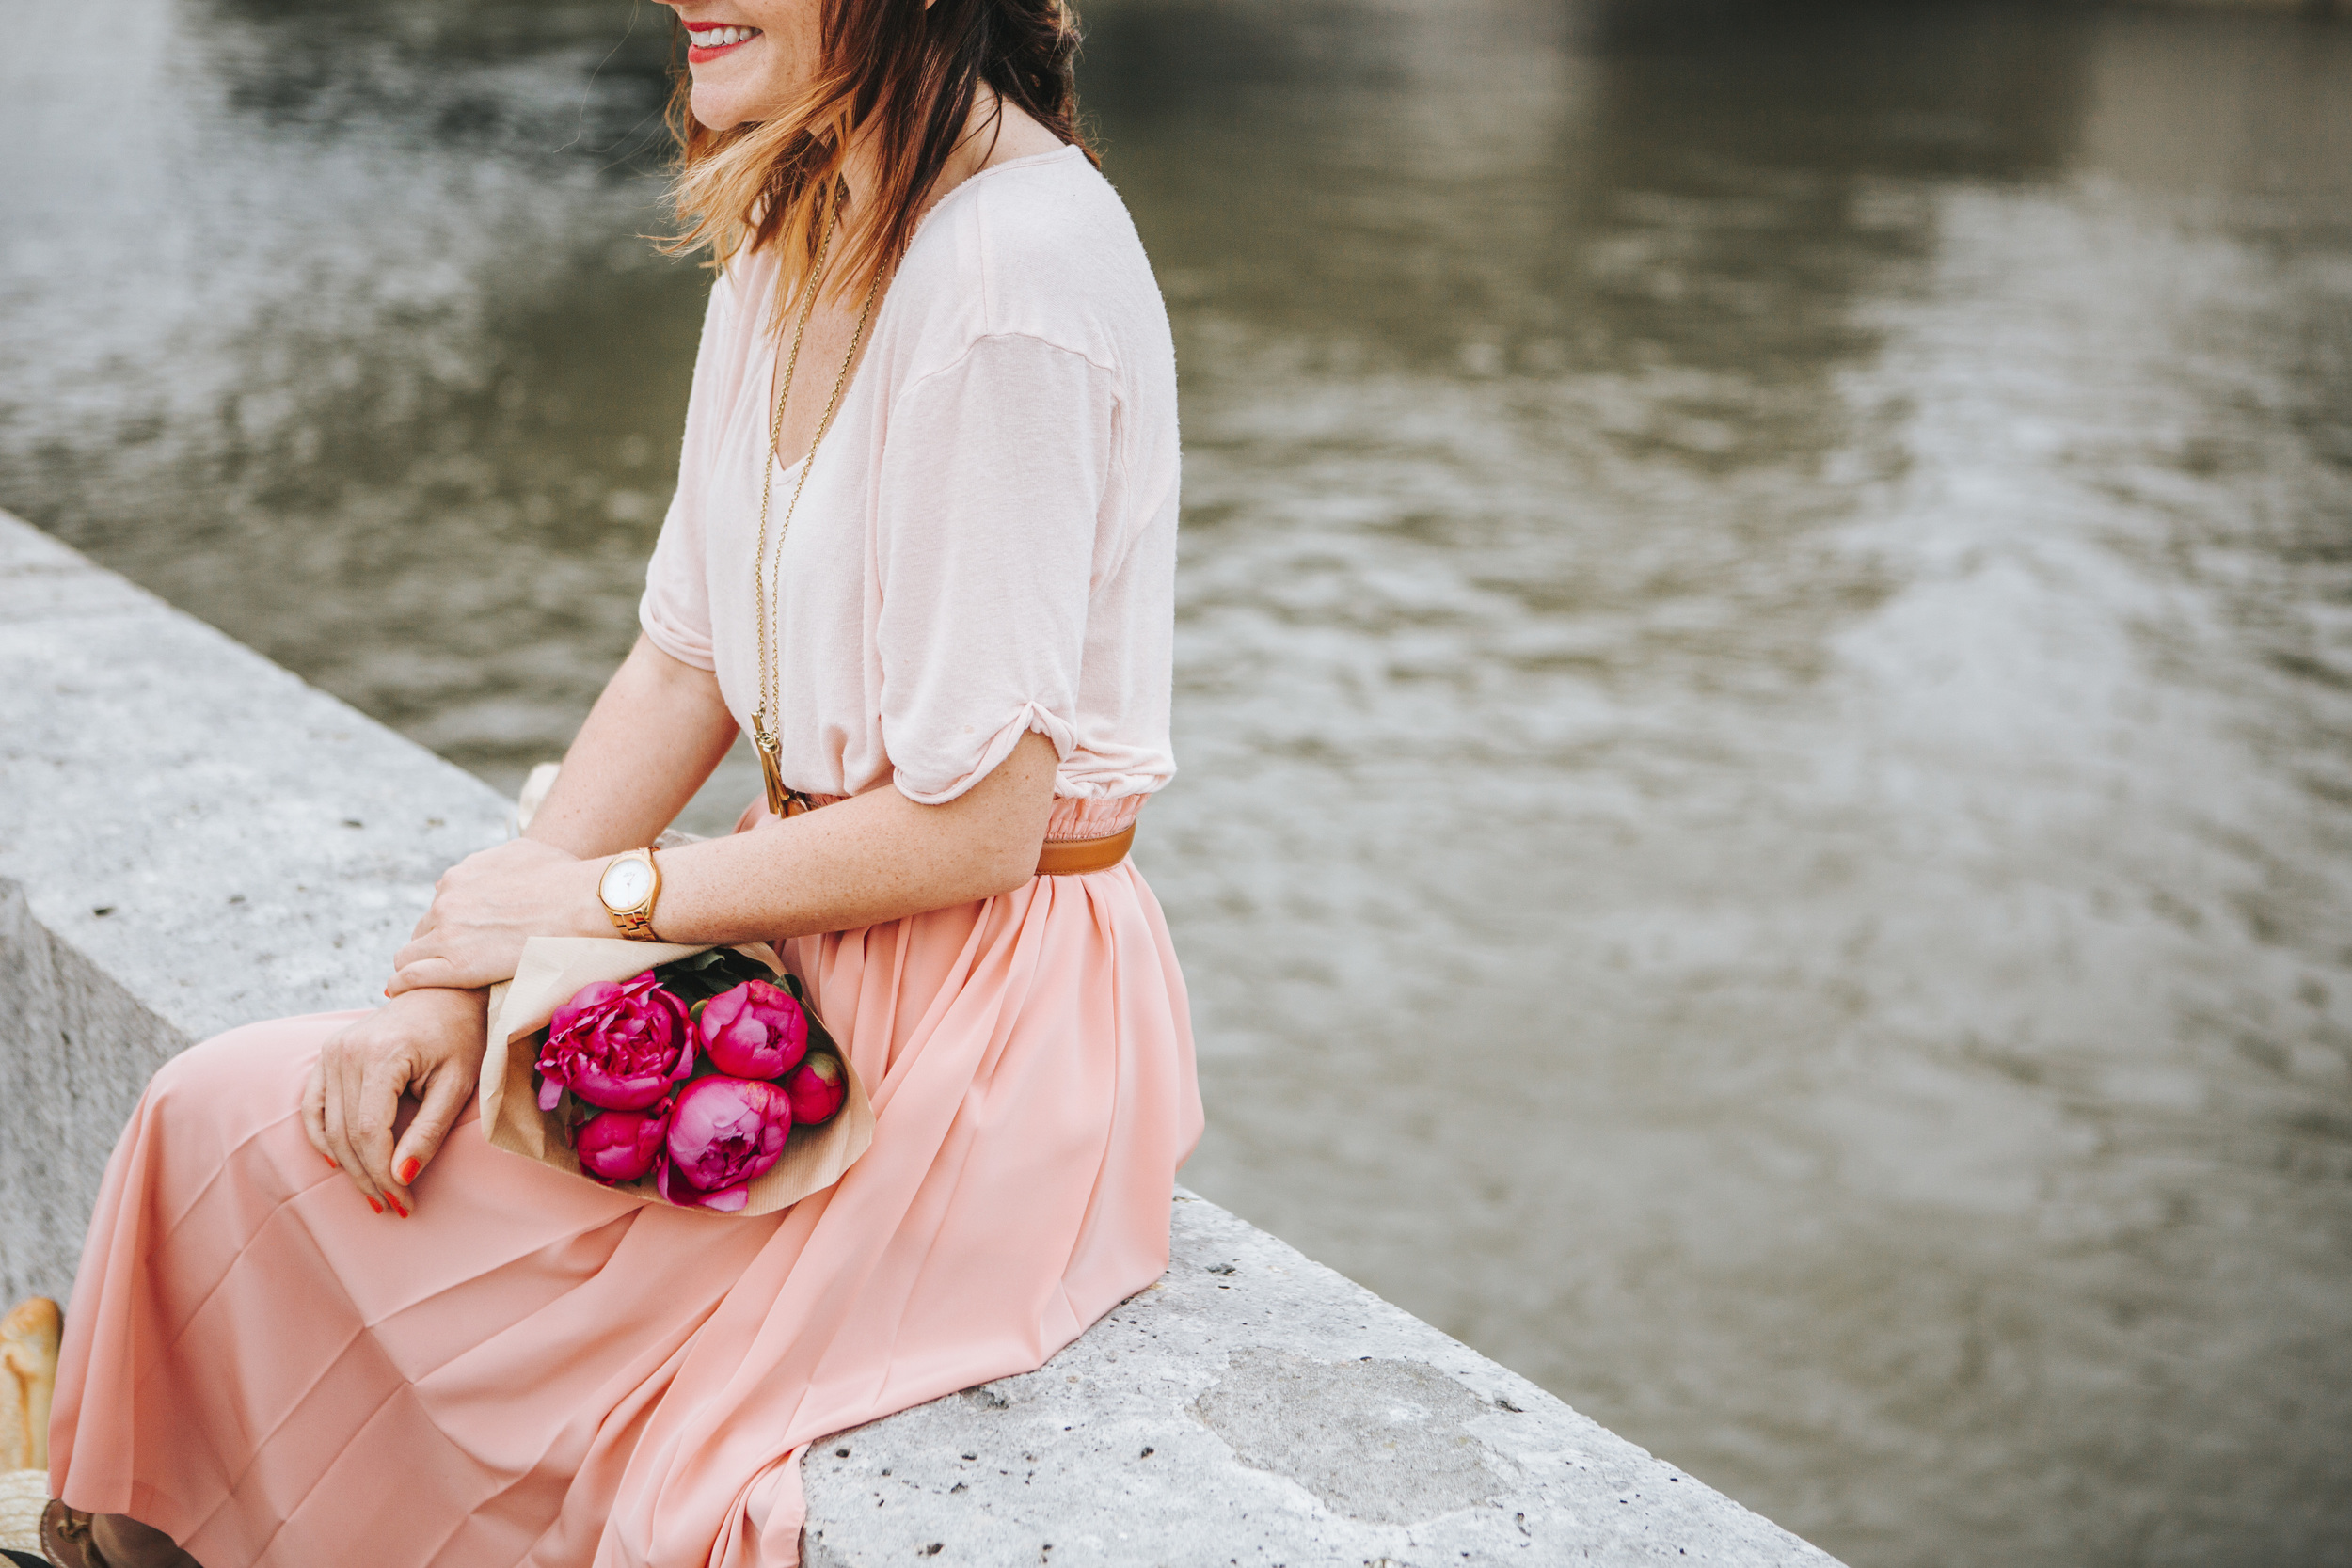 paris photographer fashion blogger lifestyle portrait by the seine river with bouquet of peonies